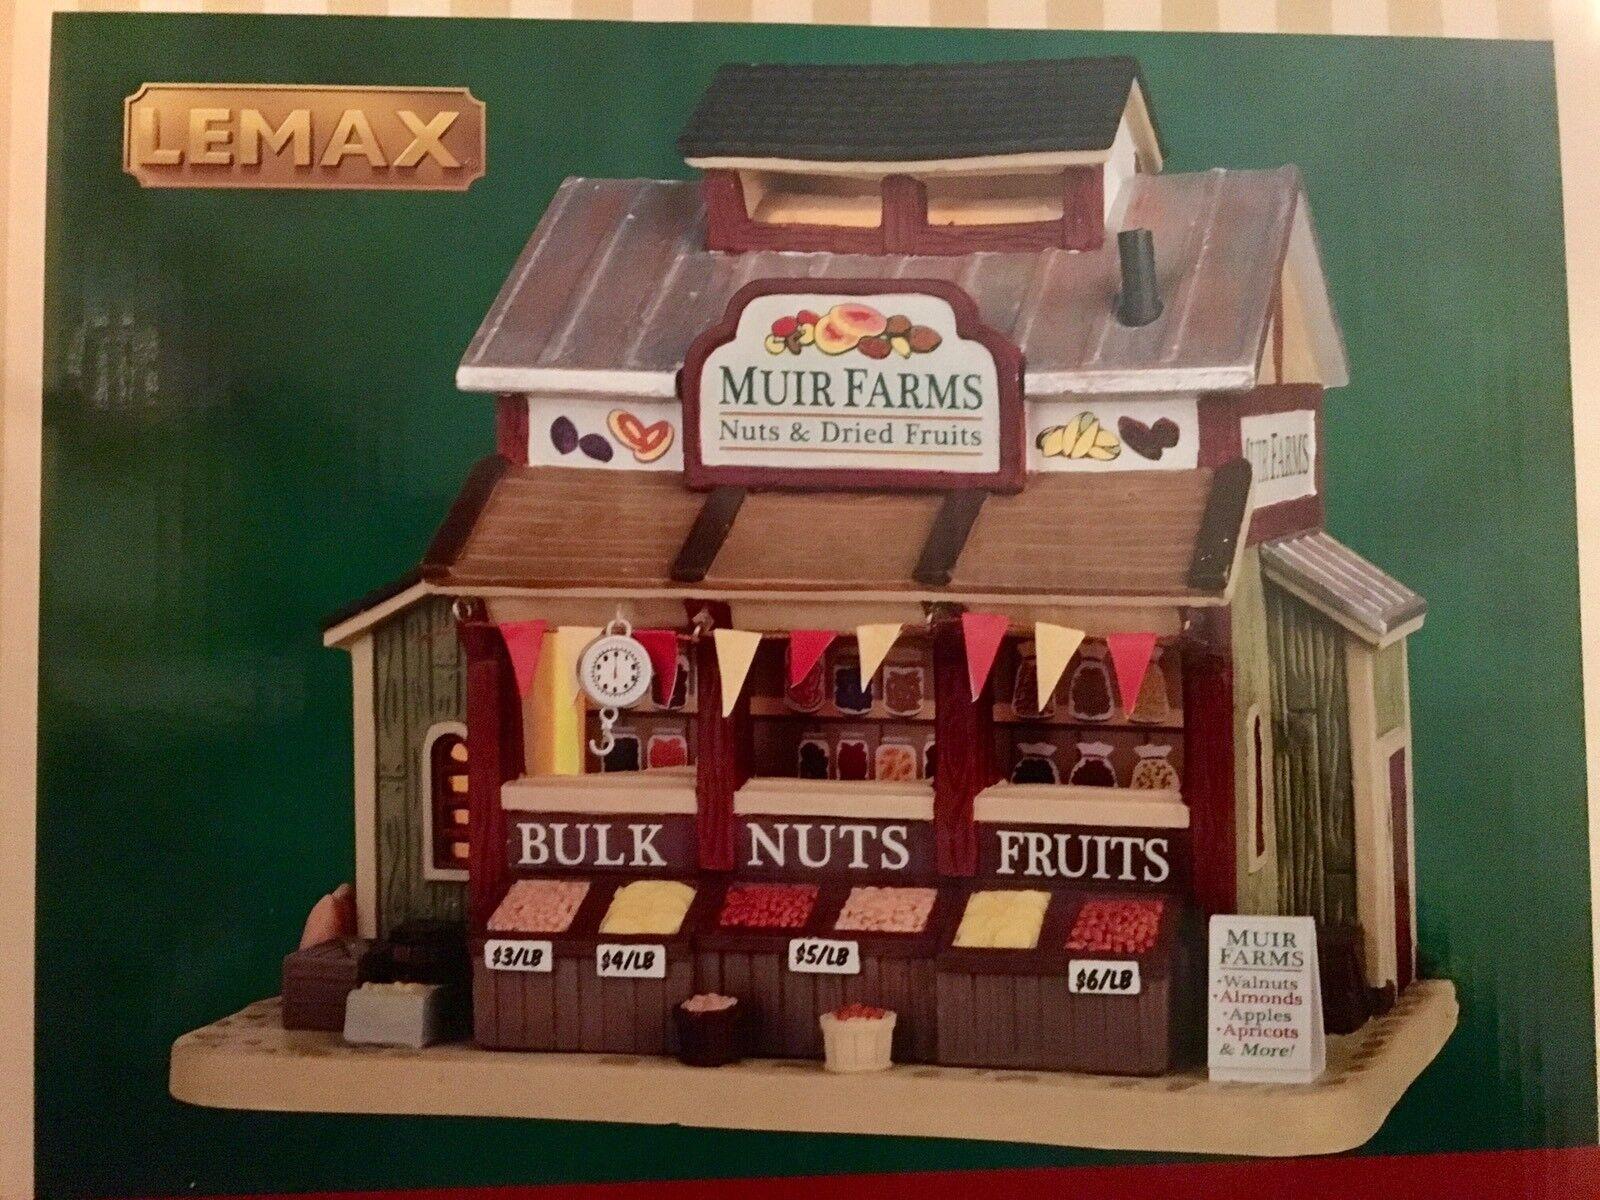 LEMAX Christmas Village Muir Farms Farms Farms eb6dac